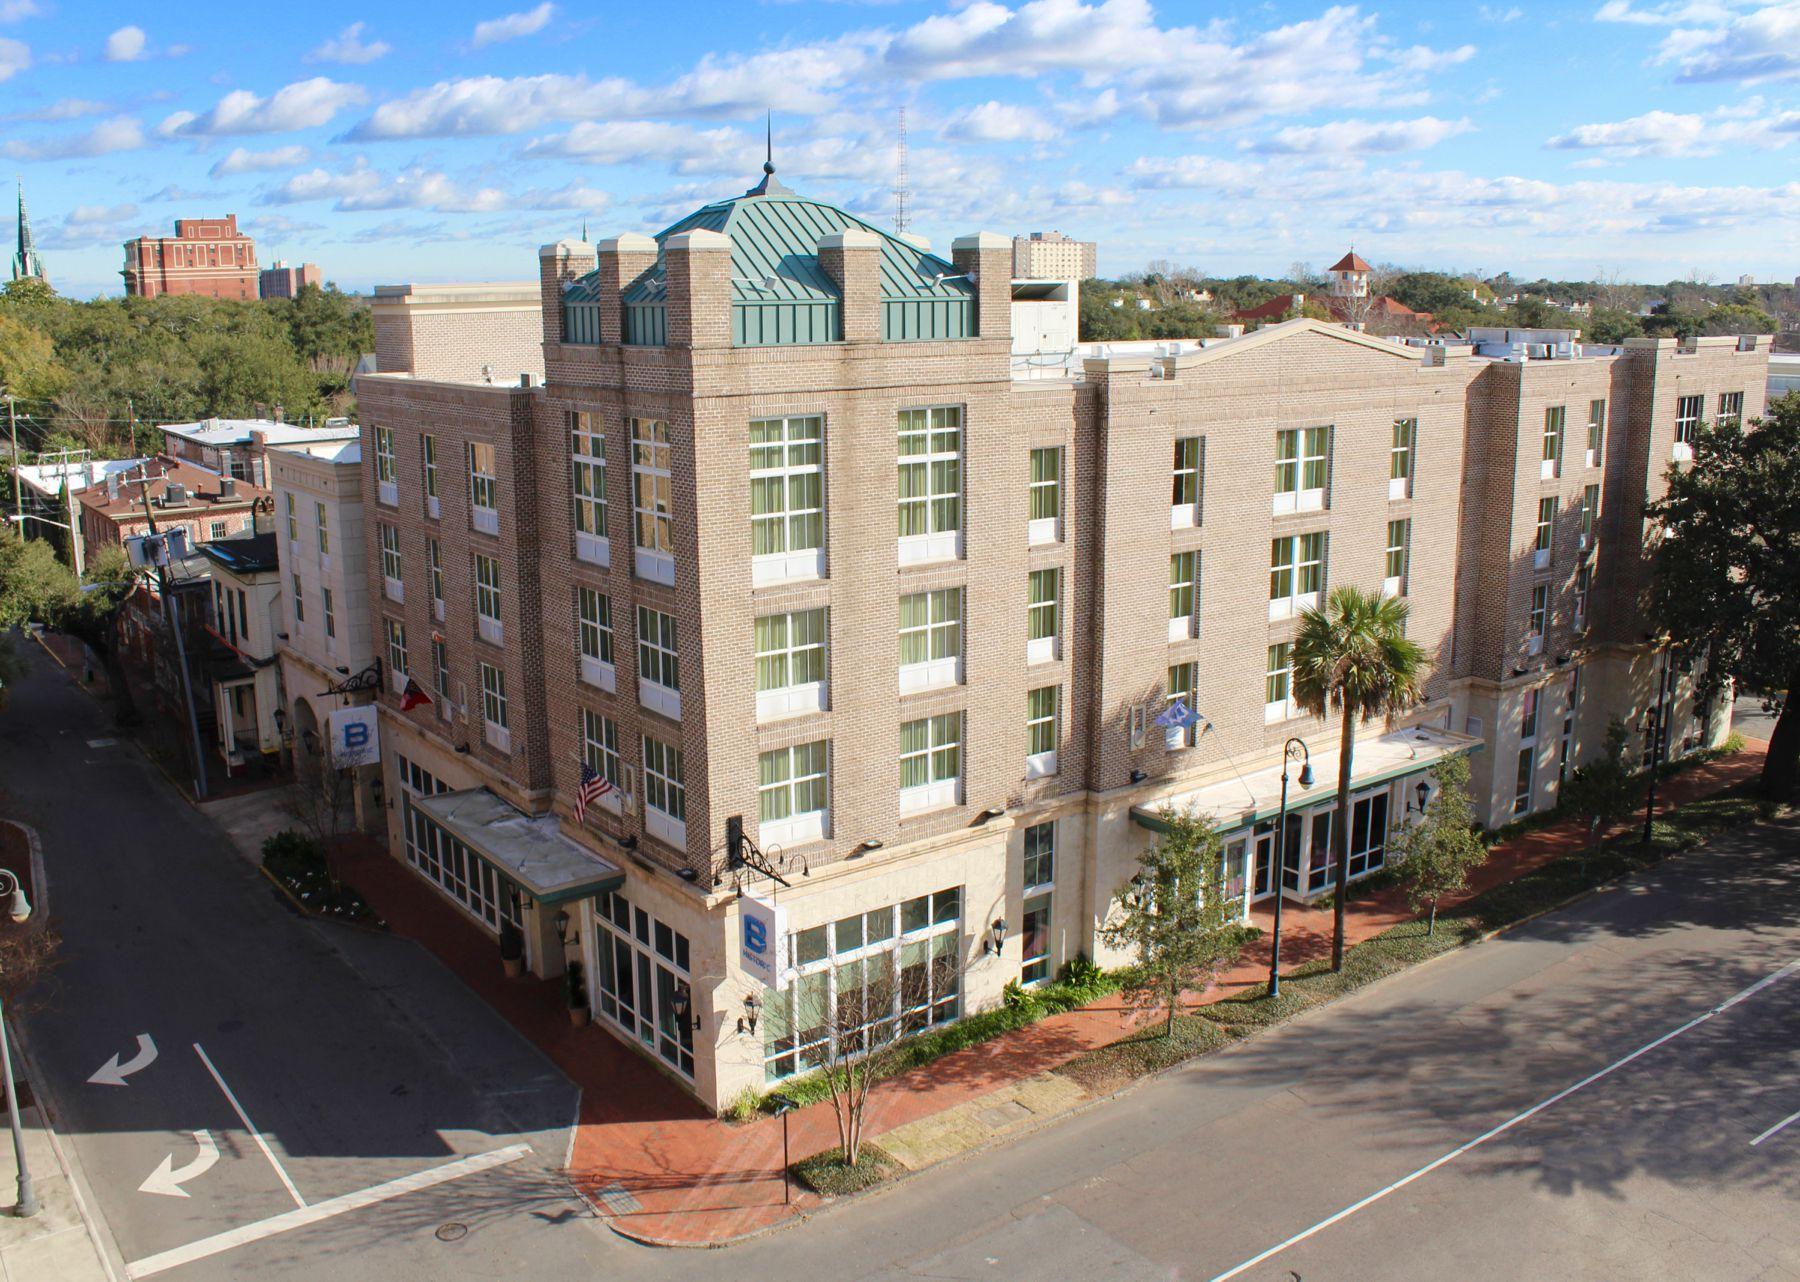 Admirable B Historic Savannah Hotel Mid Priced Central Delish Download Free Architecture Designs Licukmadebymaigaardcom